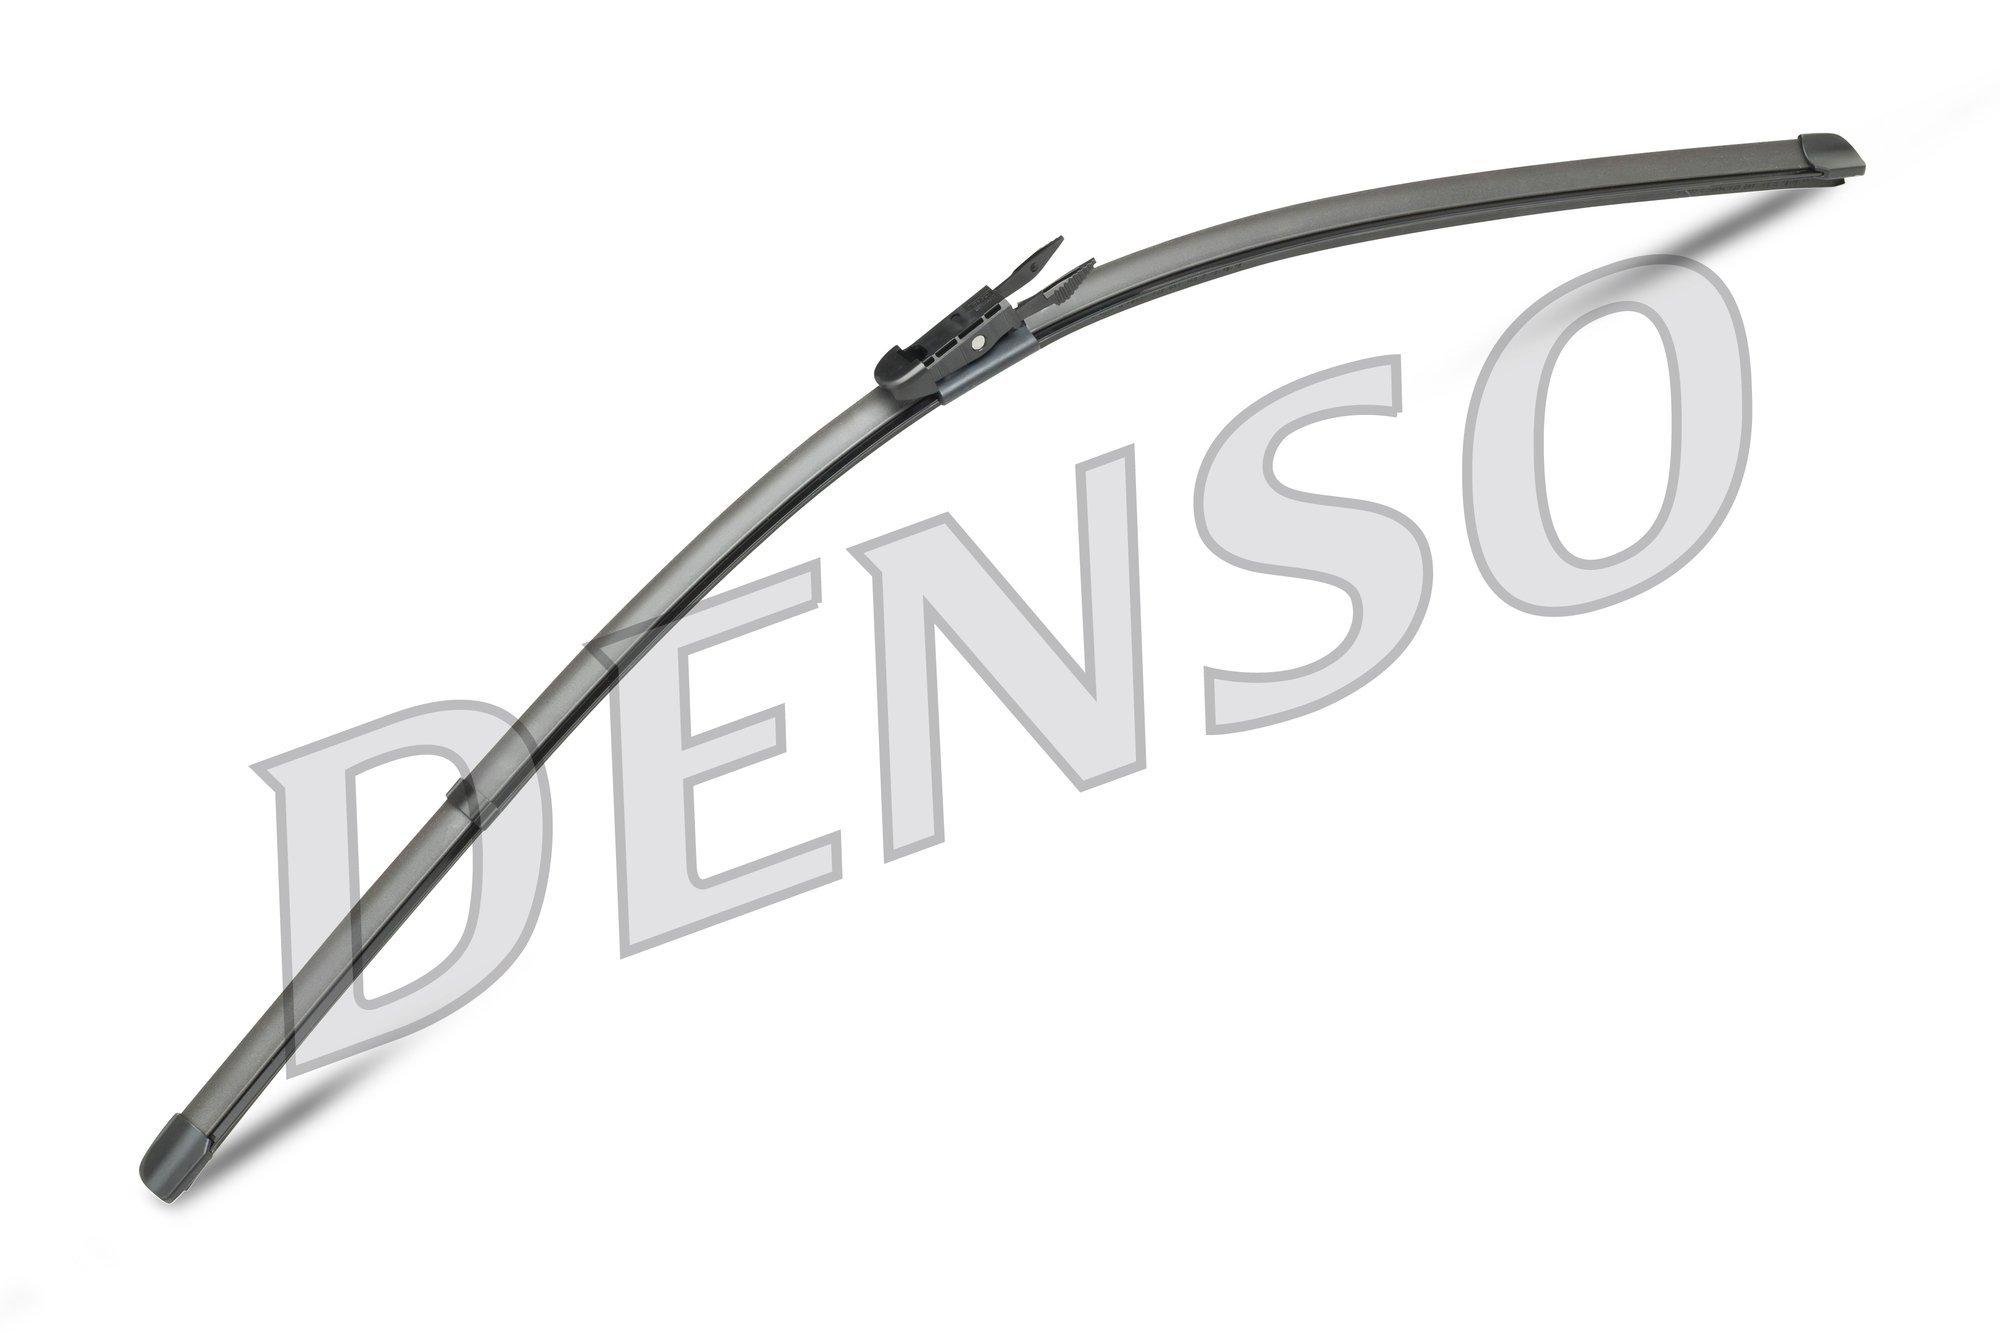 Wischblatt DENSO DF-105